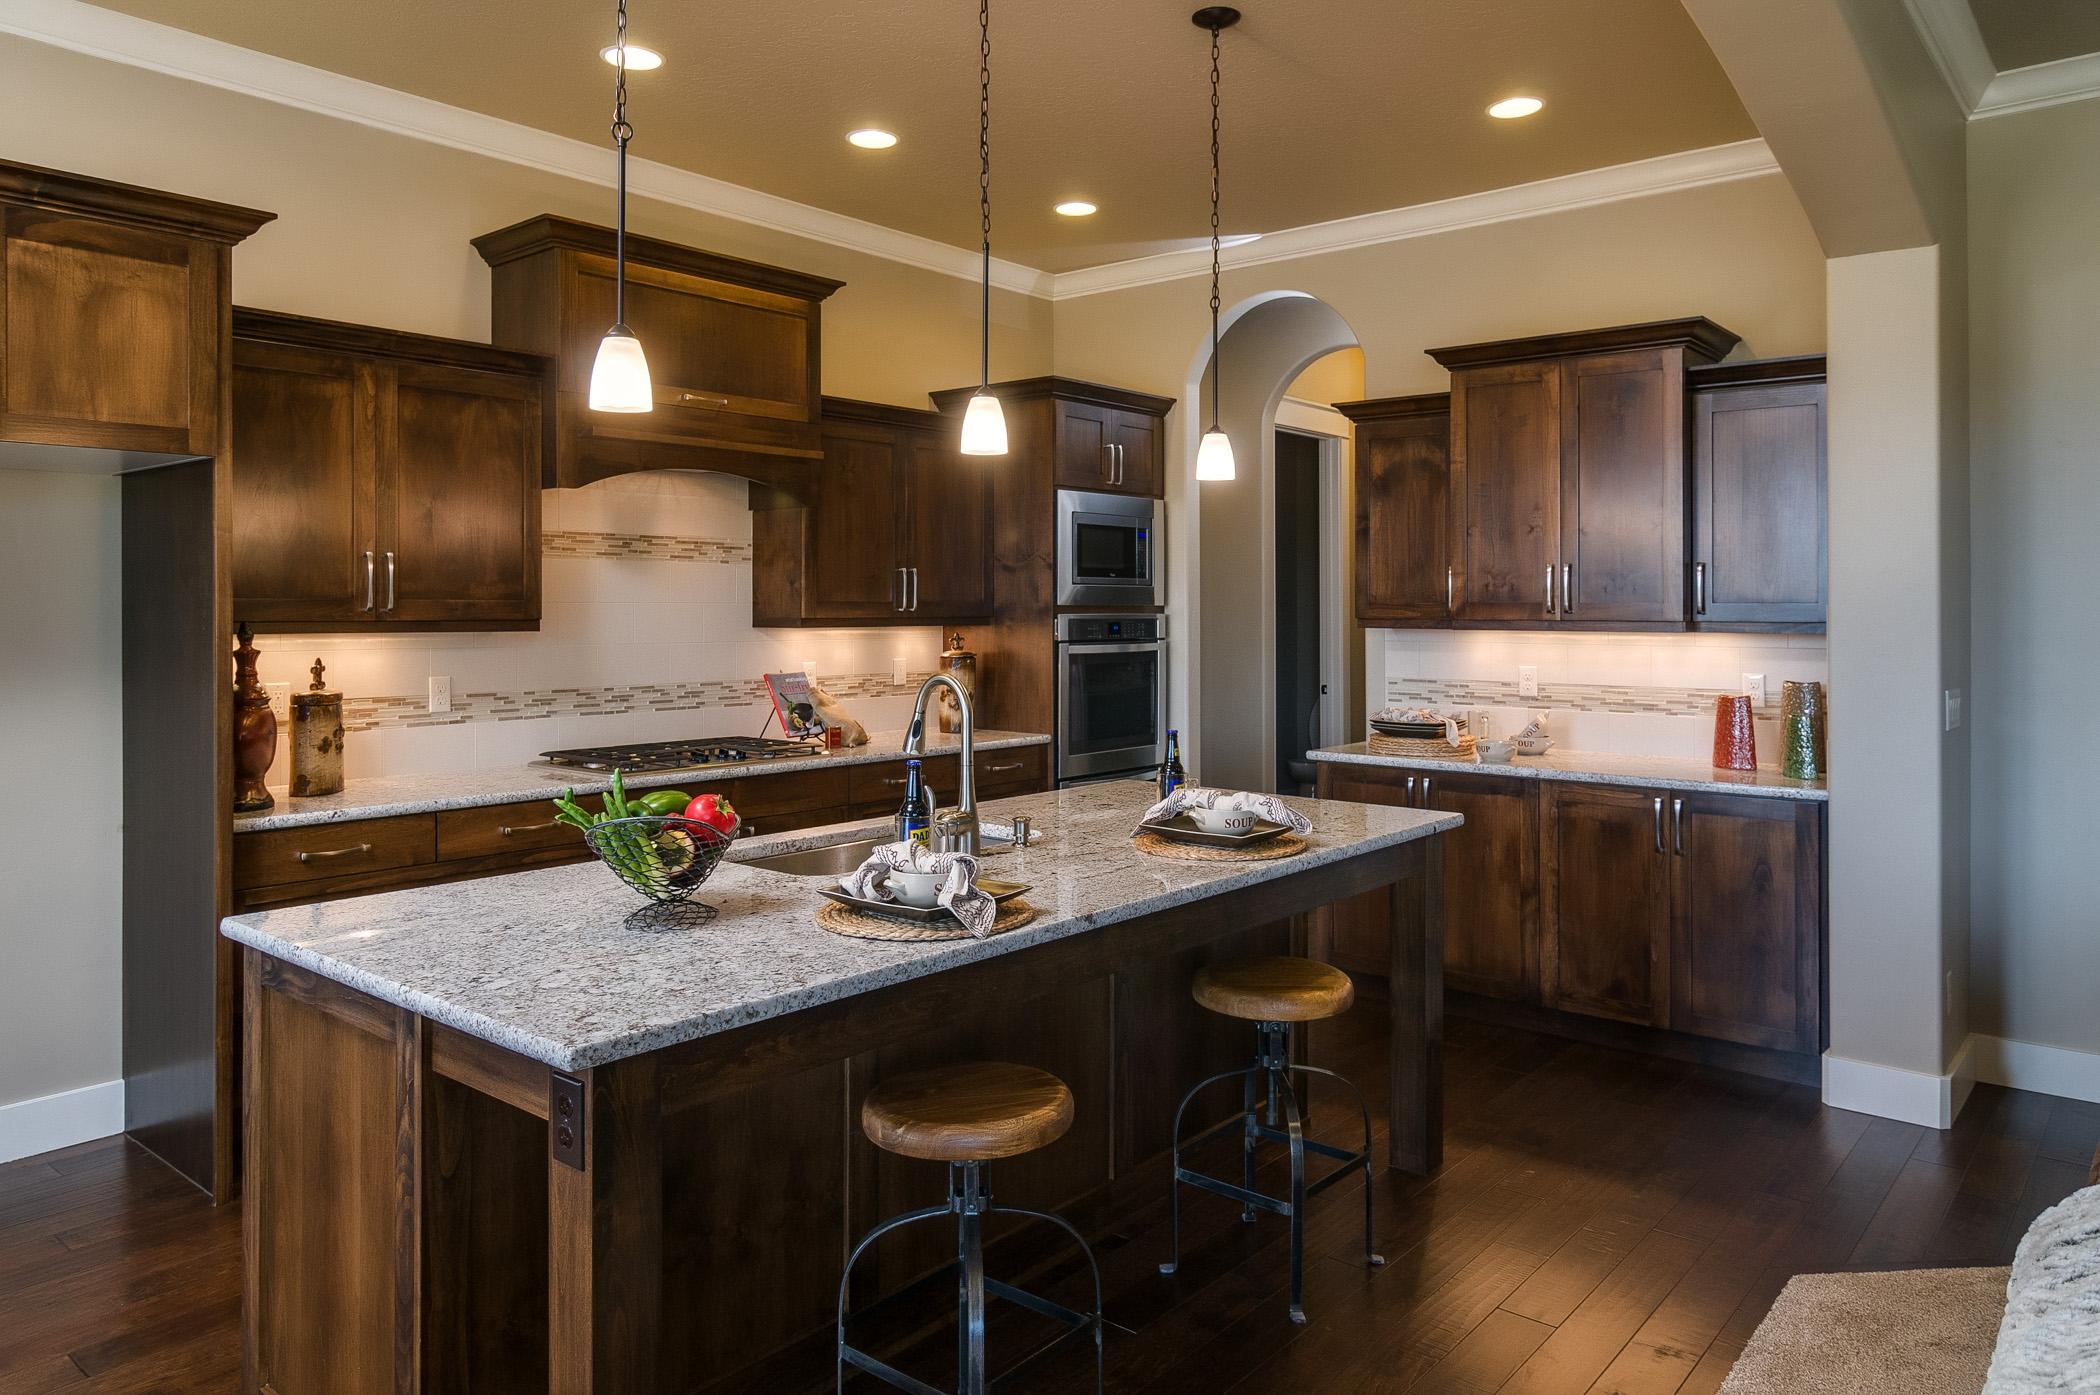 Capell Flooring - Granite Counters, Granite Slab, Meridian Floors